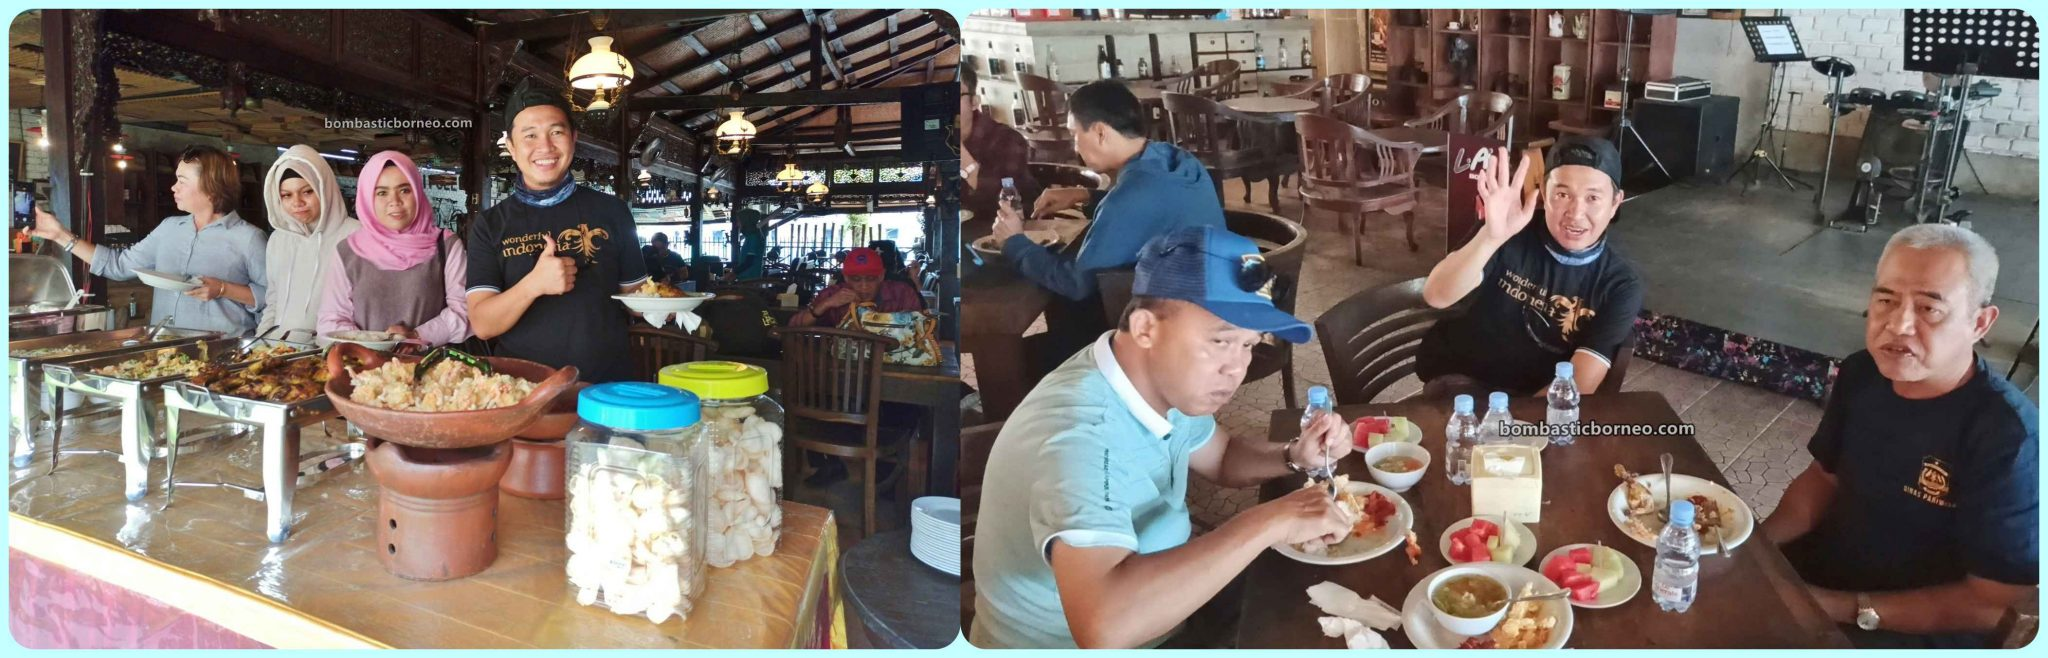 backpackers, destination, exploration, Indonesia, Kaltara, Malabar Cafe, objek wisata, Pariwisata, Tourism, tourist attraction, Trans Border,